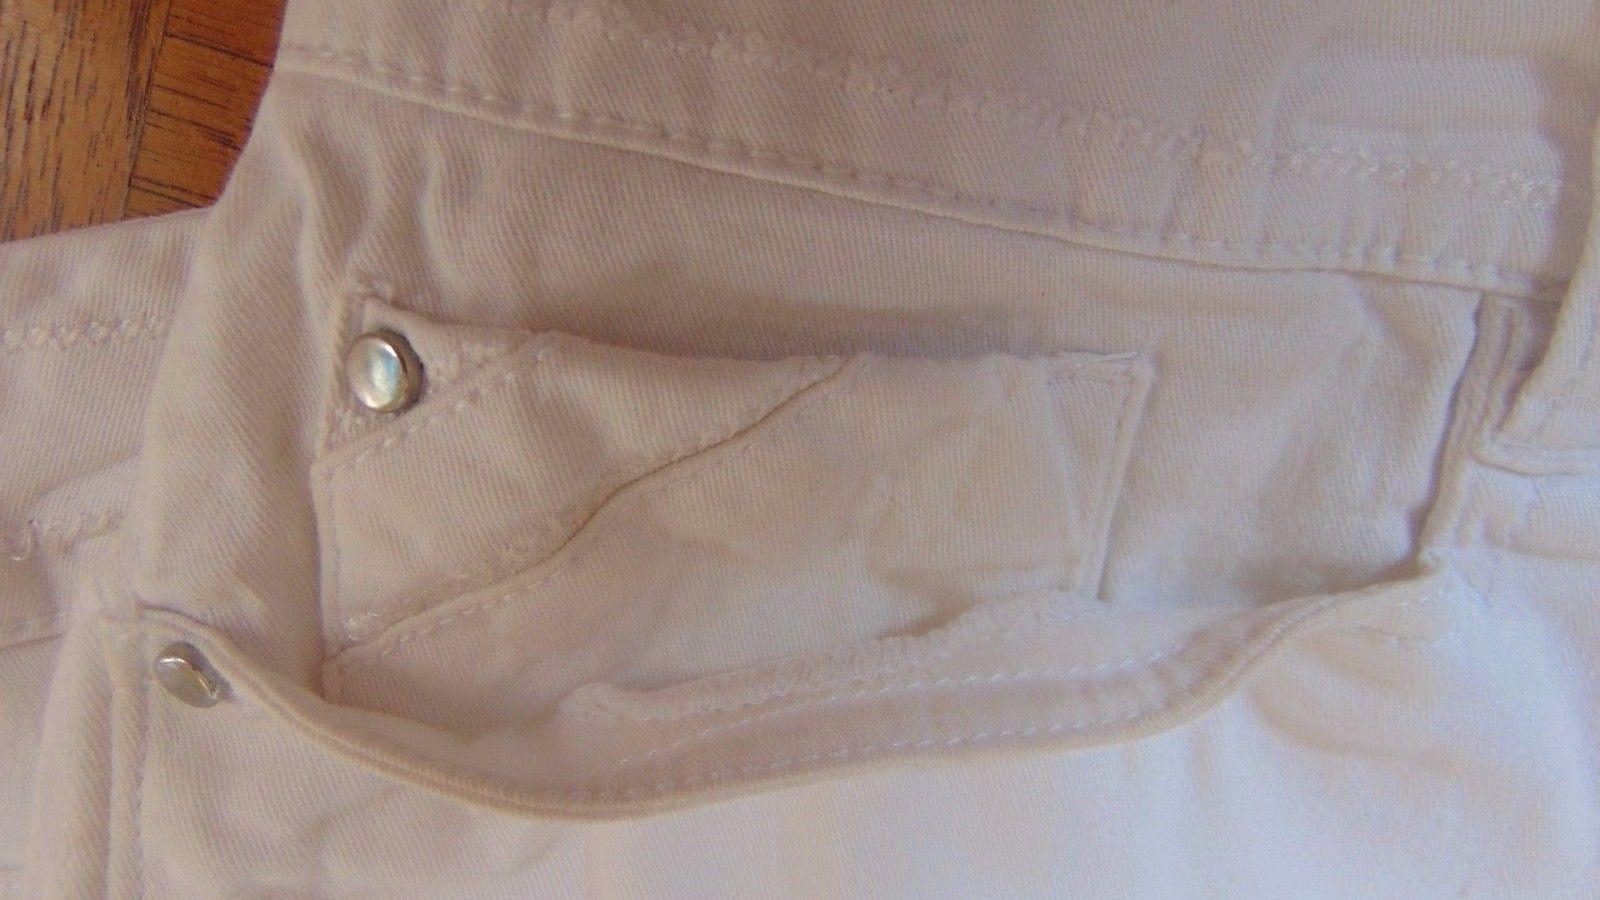 Shorts Burmudas Walking Dressbarn-Size 16-4 Pockets Belt Loops-Silver Brads---32